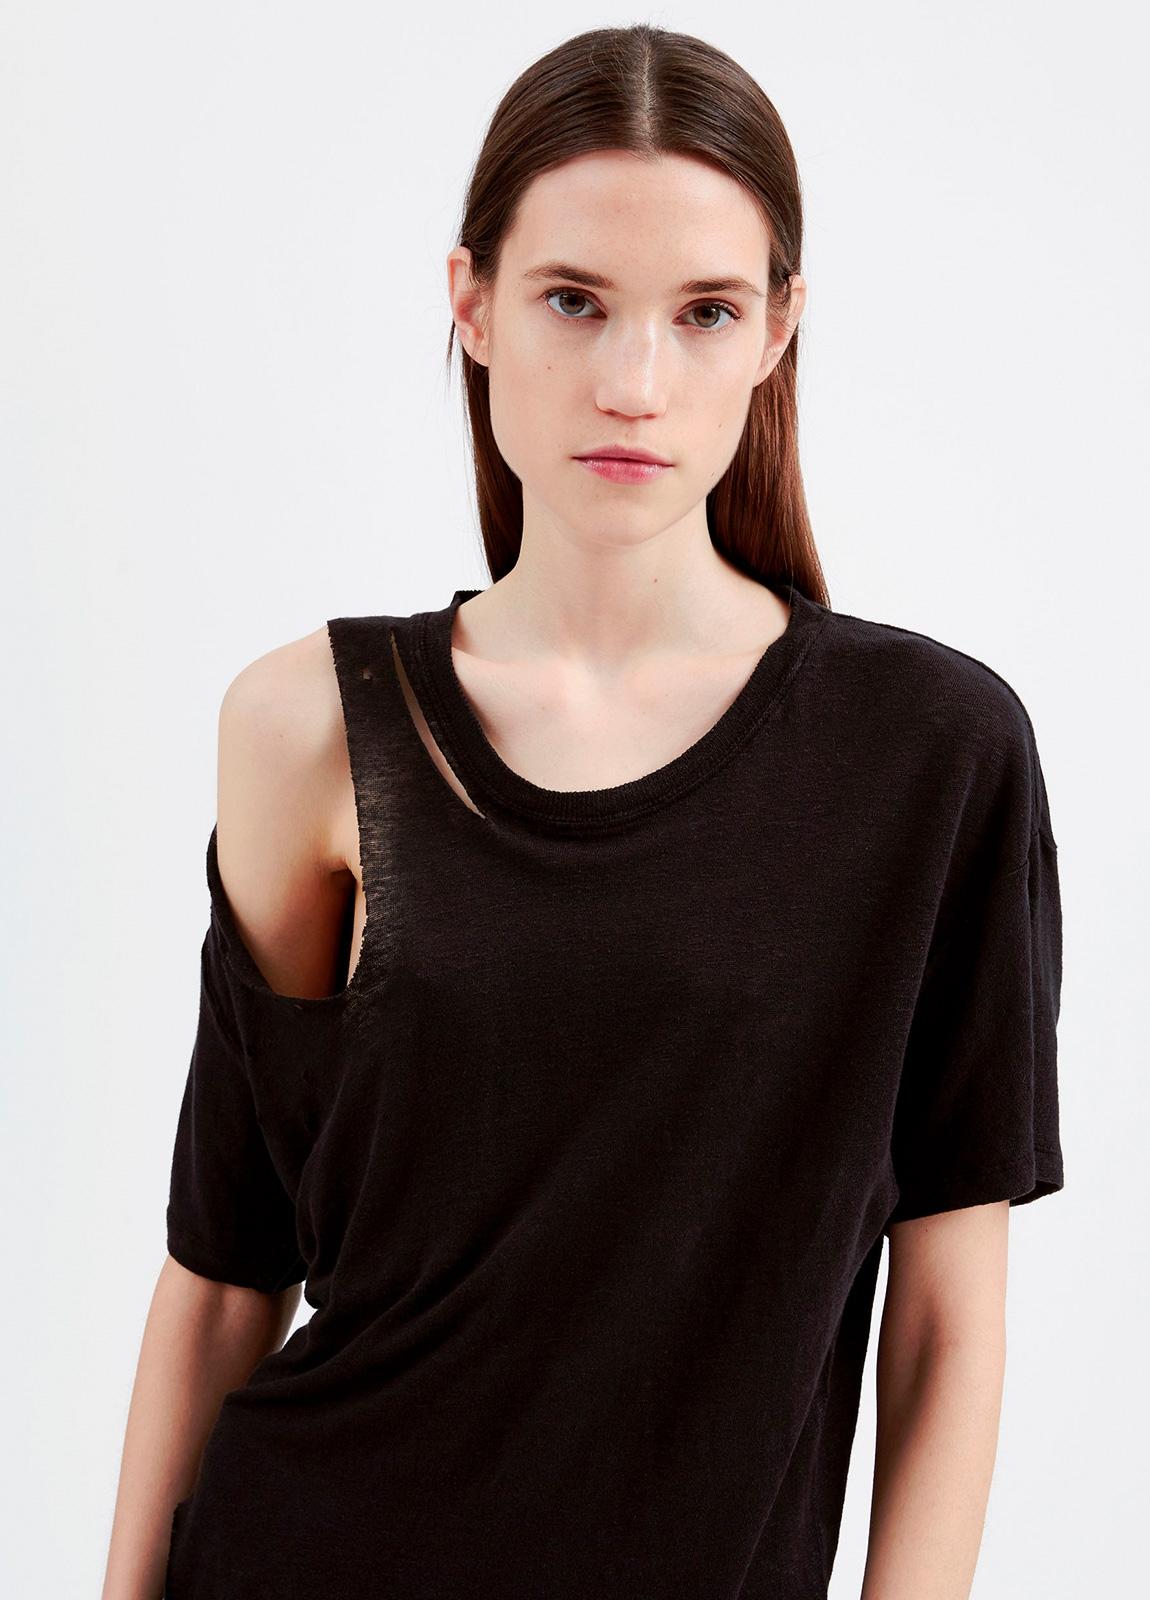 Camiseta asimétrica de manga corta color negro. 100% Lino